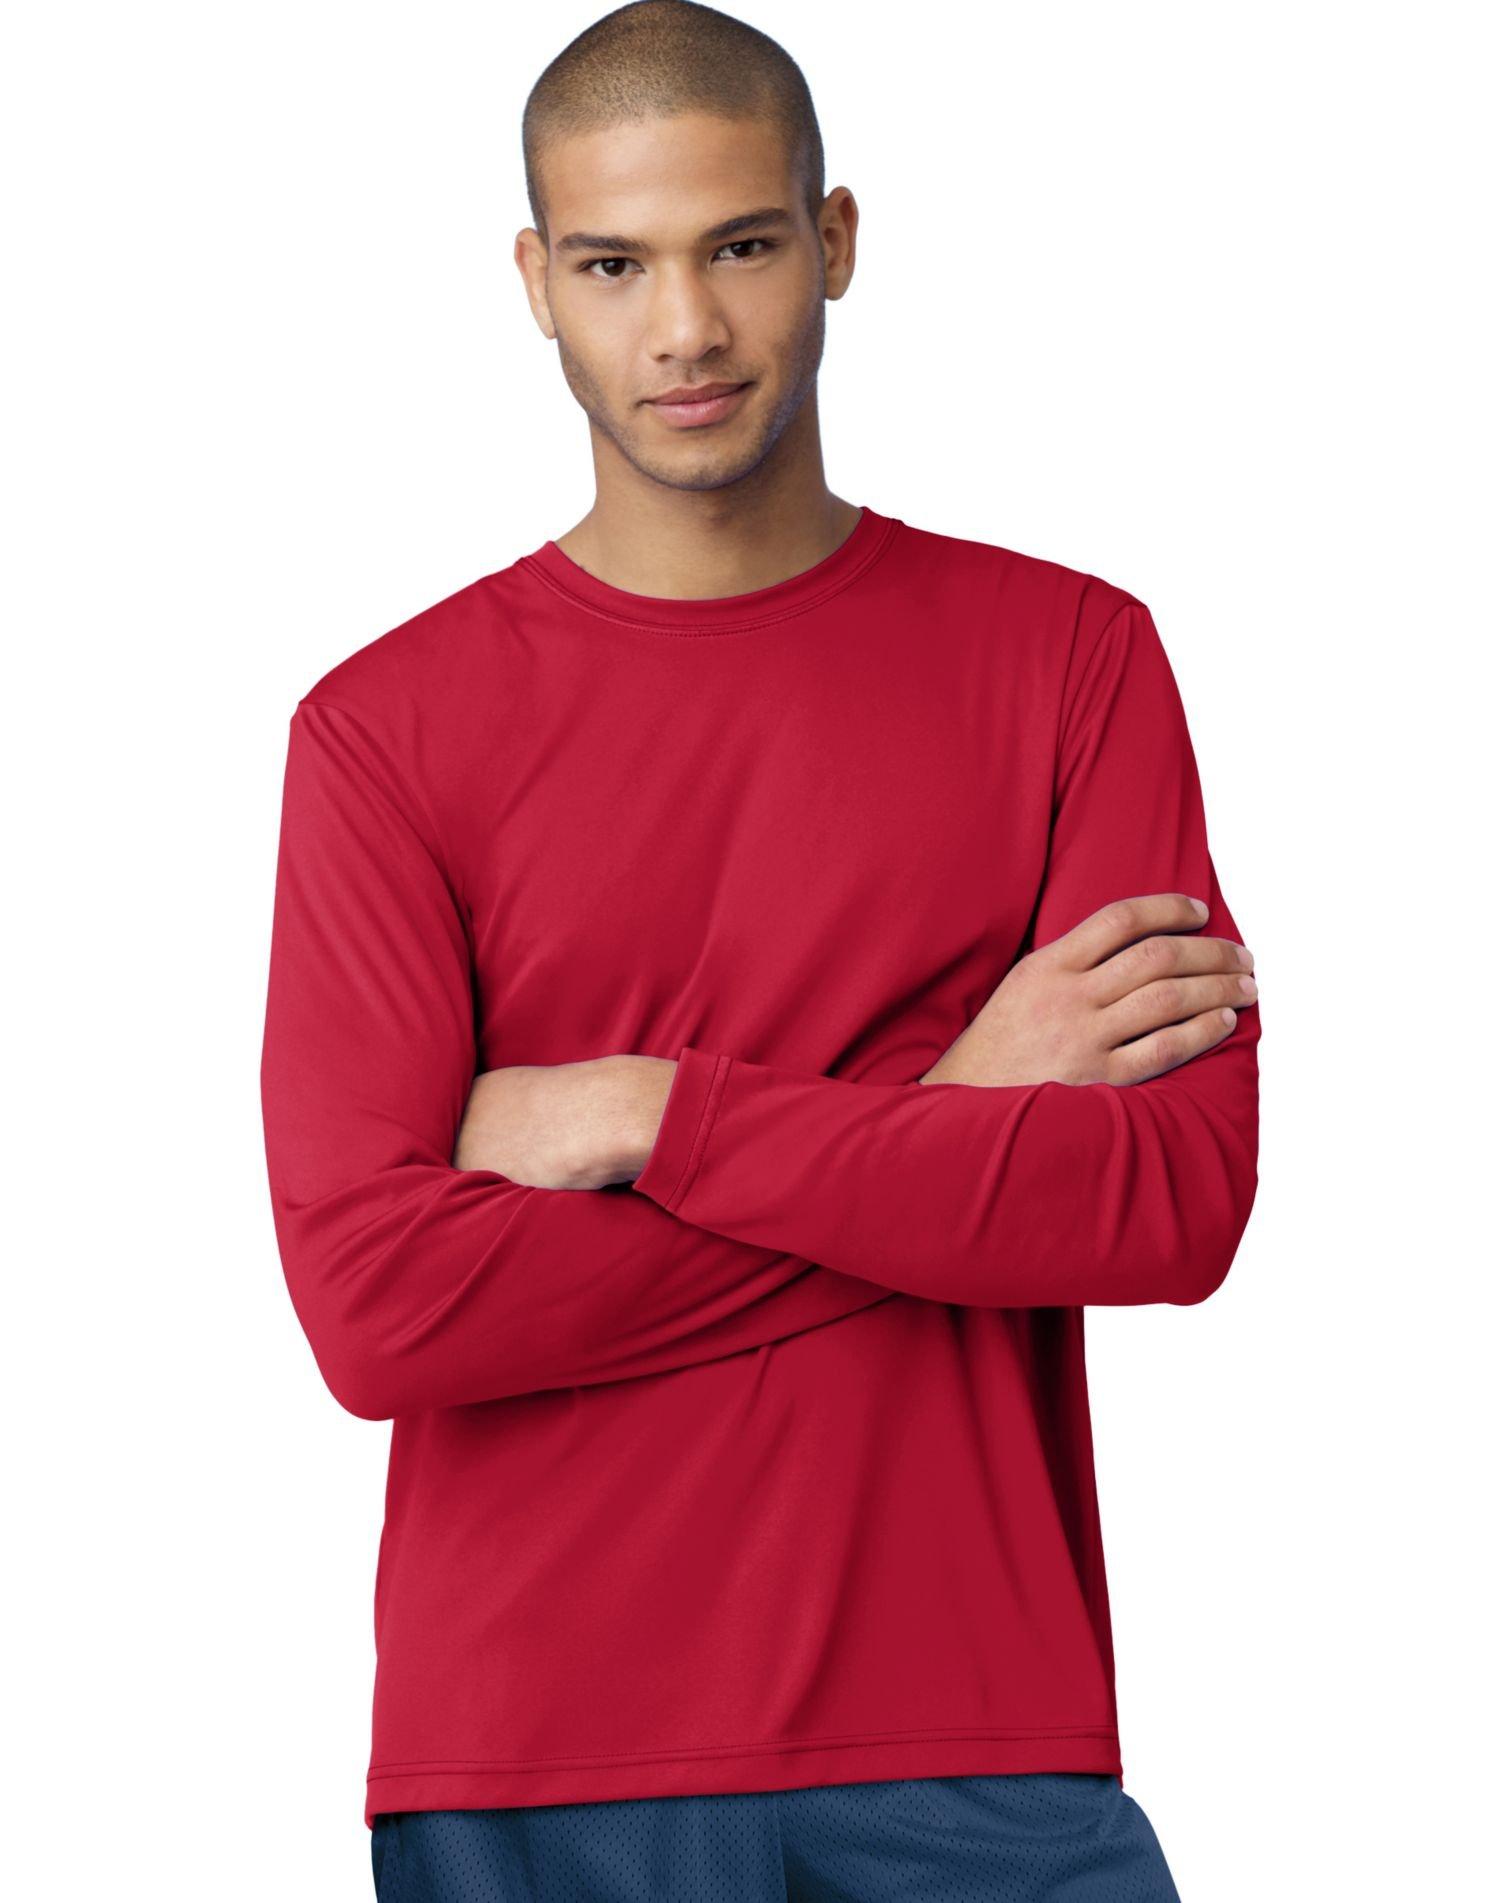 Hanes Adult Cool Dri Long Sleeve Performance Tee, Deep Red, X-Large